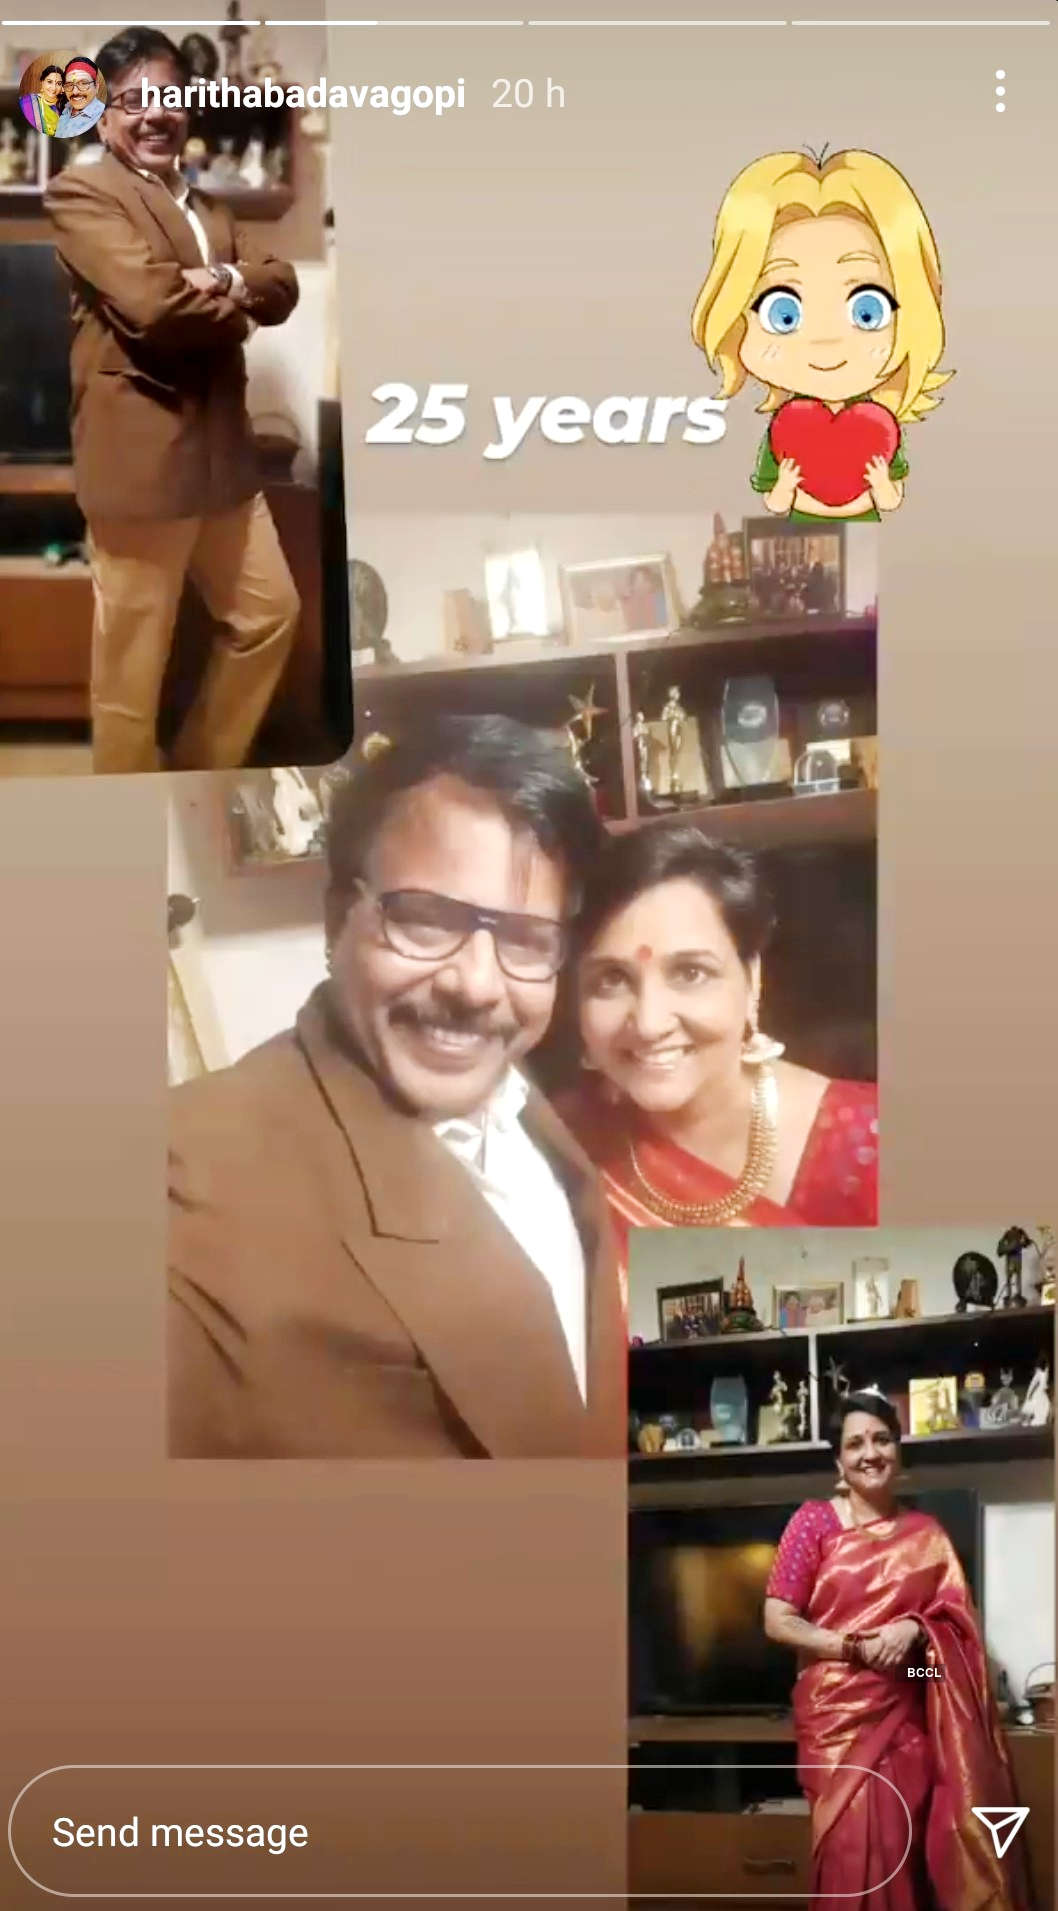 Badava Gopi - Haritha celebrated their 25th wedding anniversary